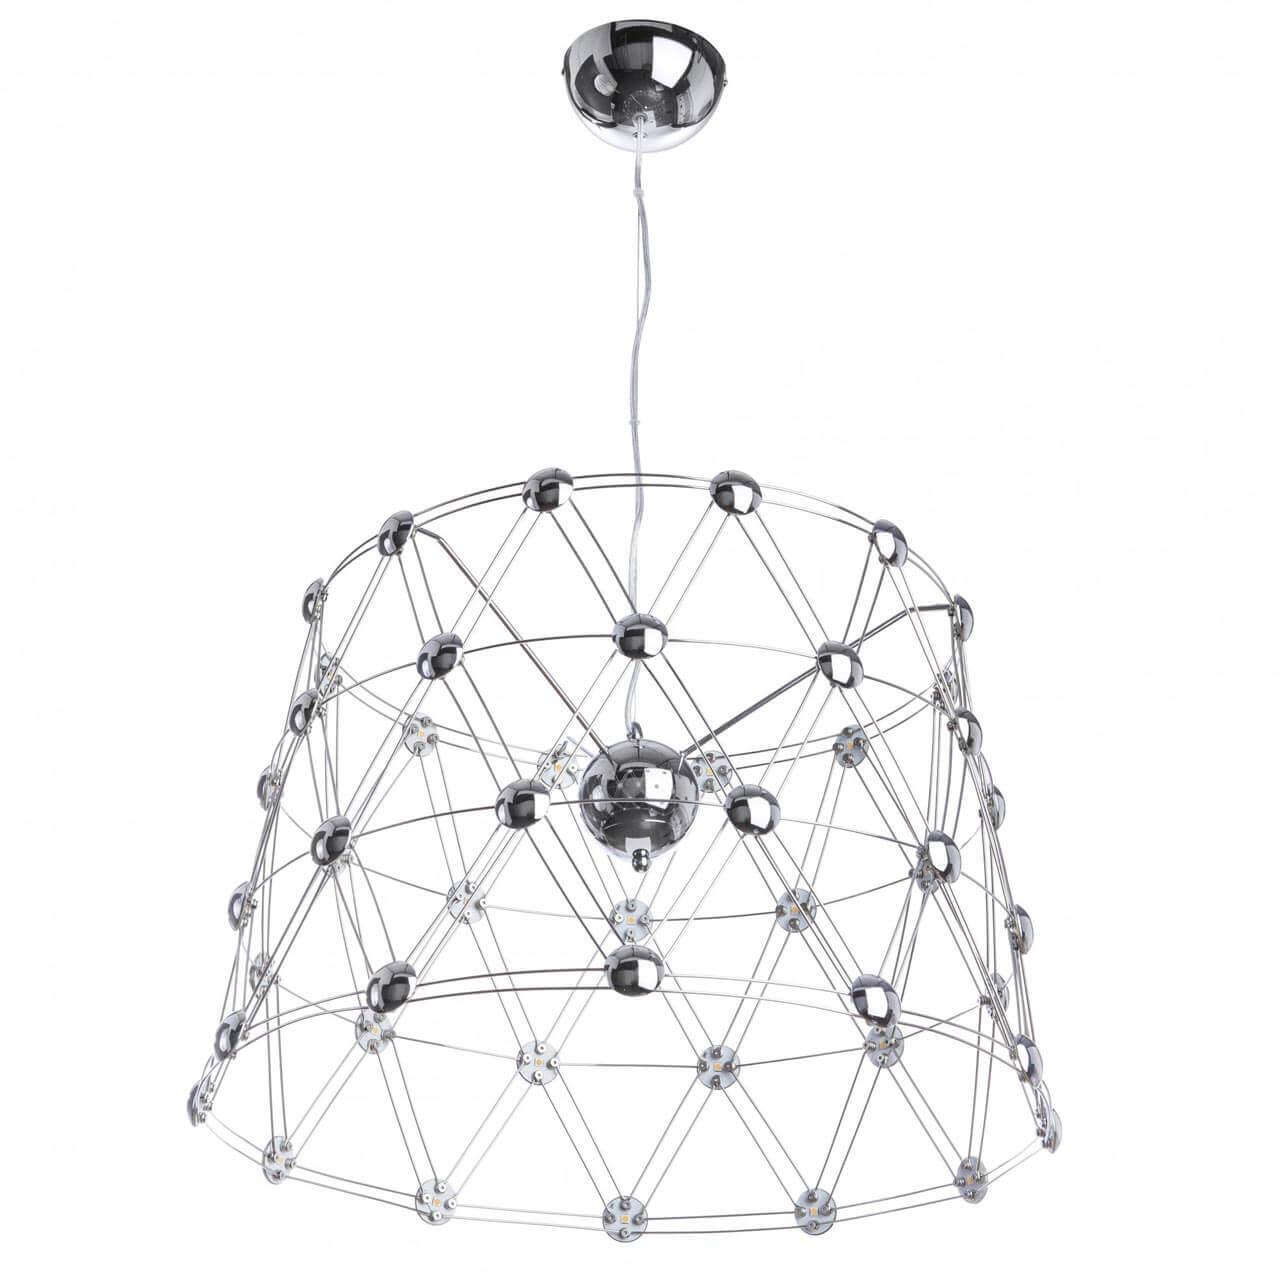 цена на Светильник Divinare 1608/02 SP-48 1608